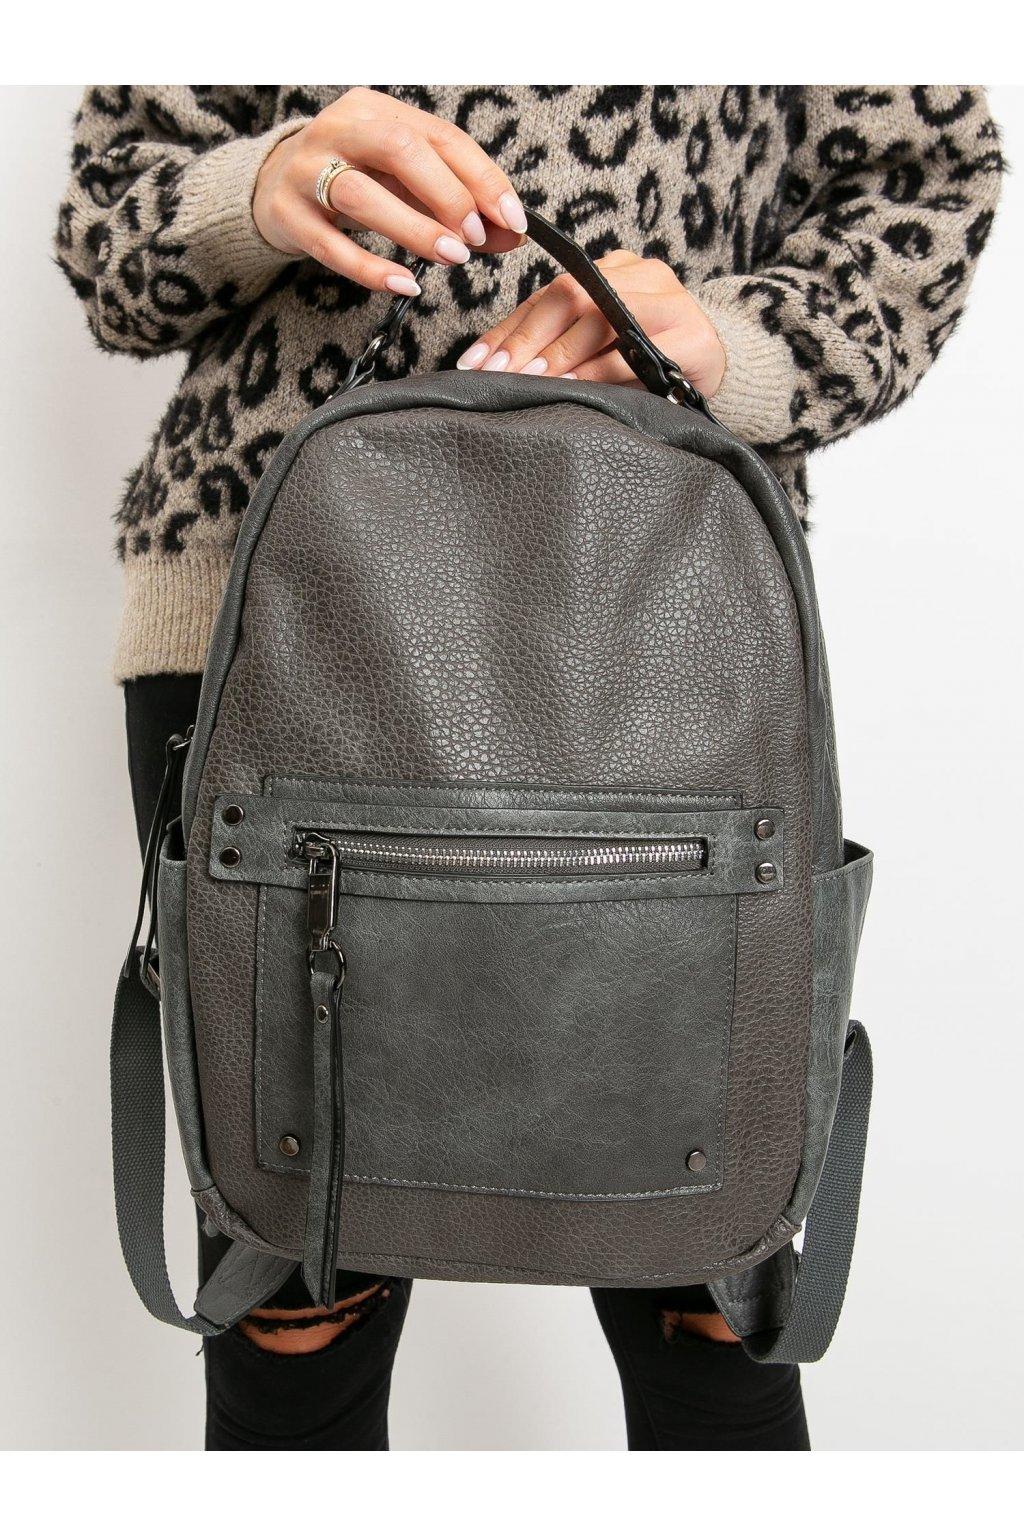 Sivá kabelka NJSK OW-TR-X7182.68